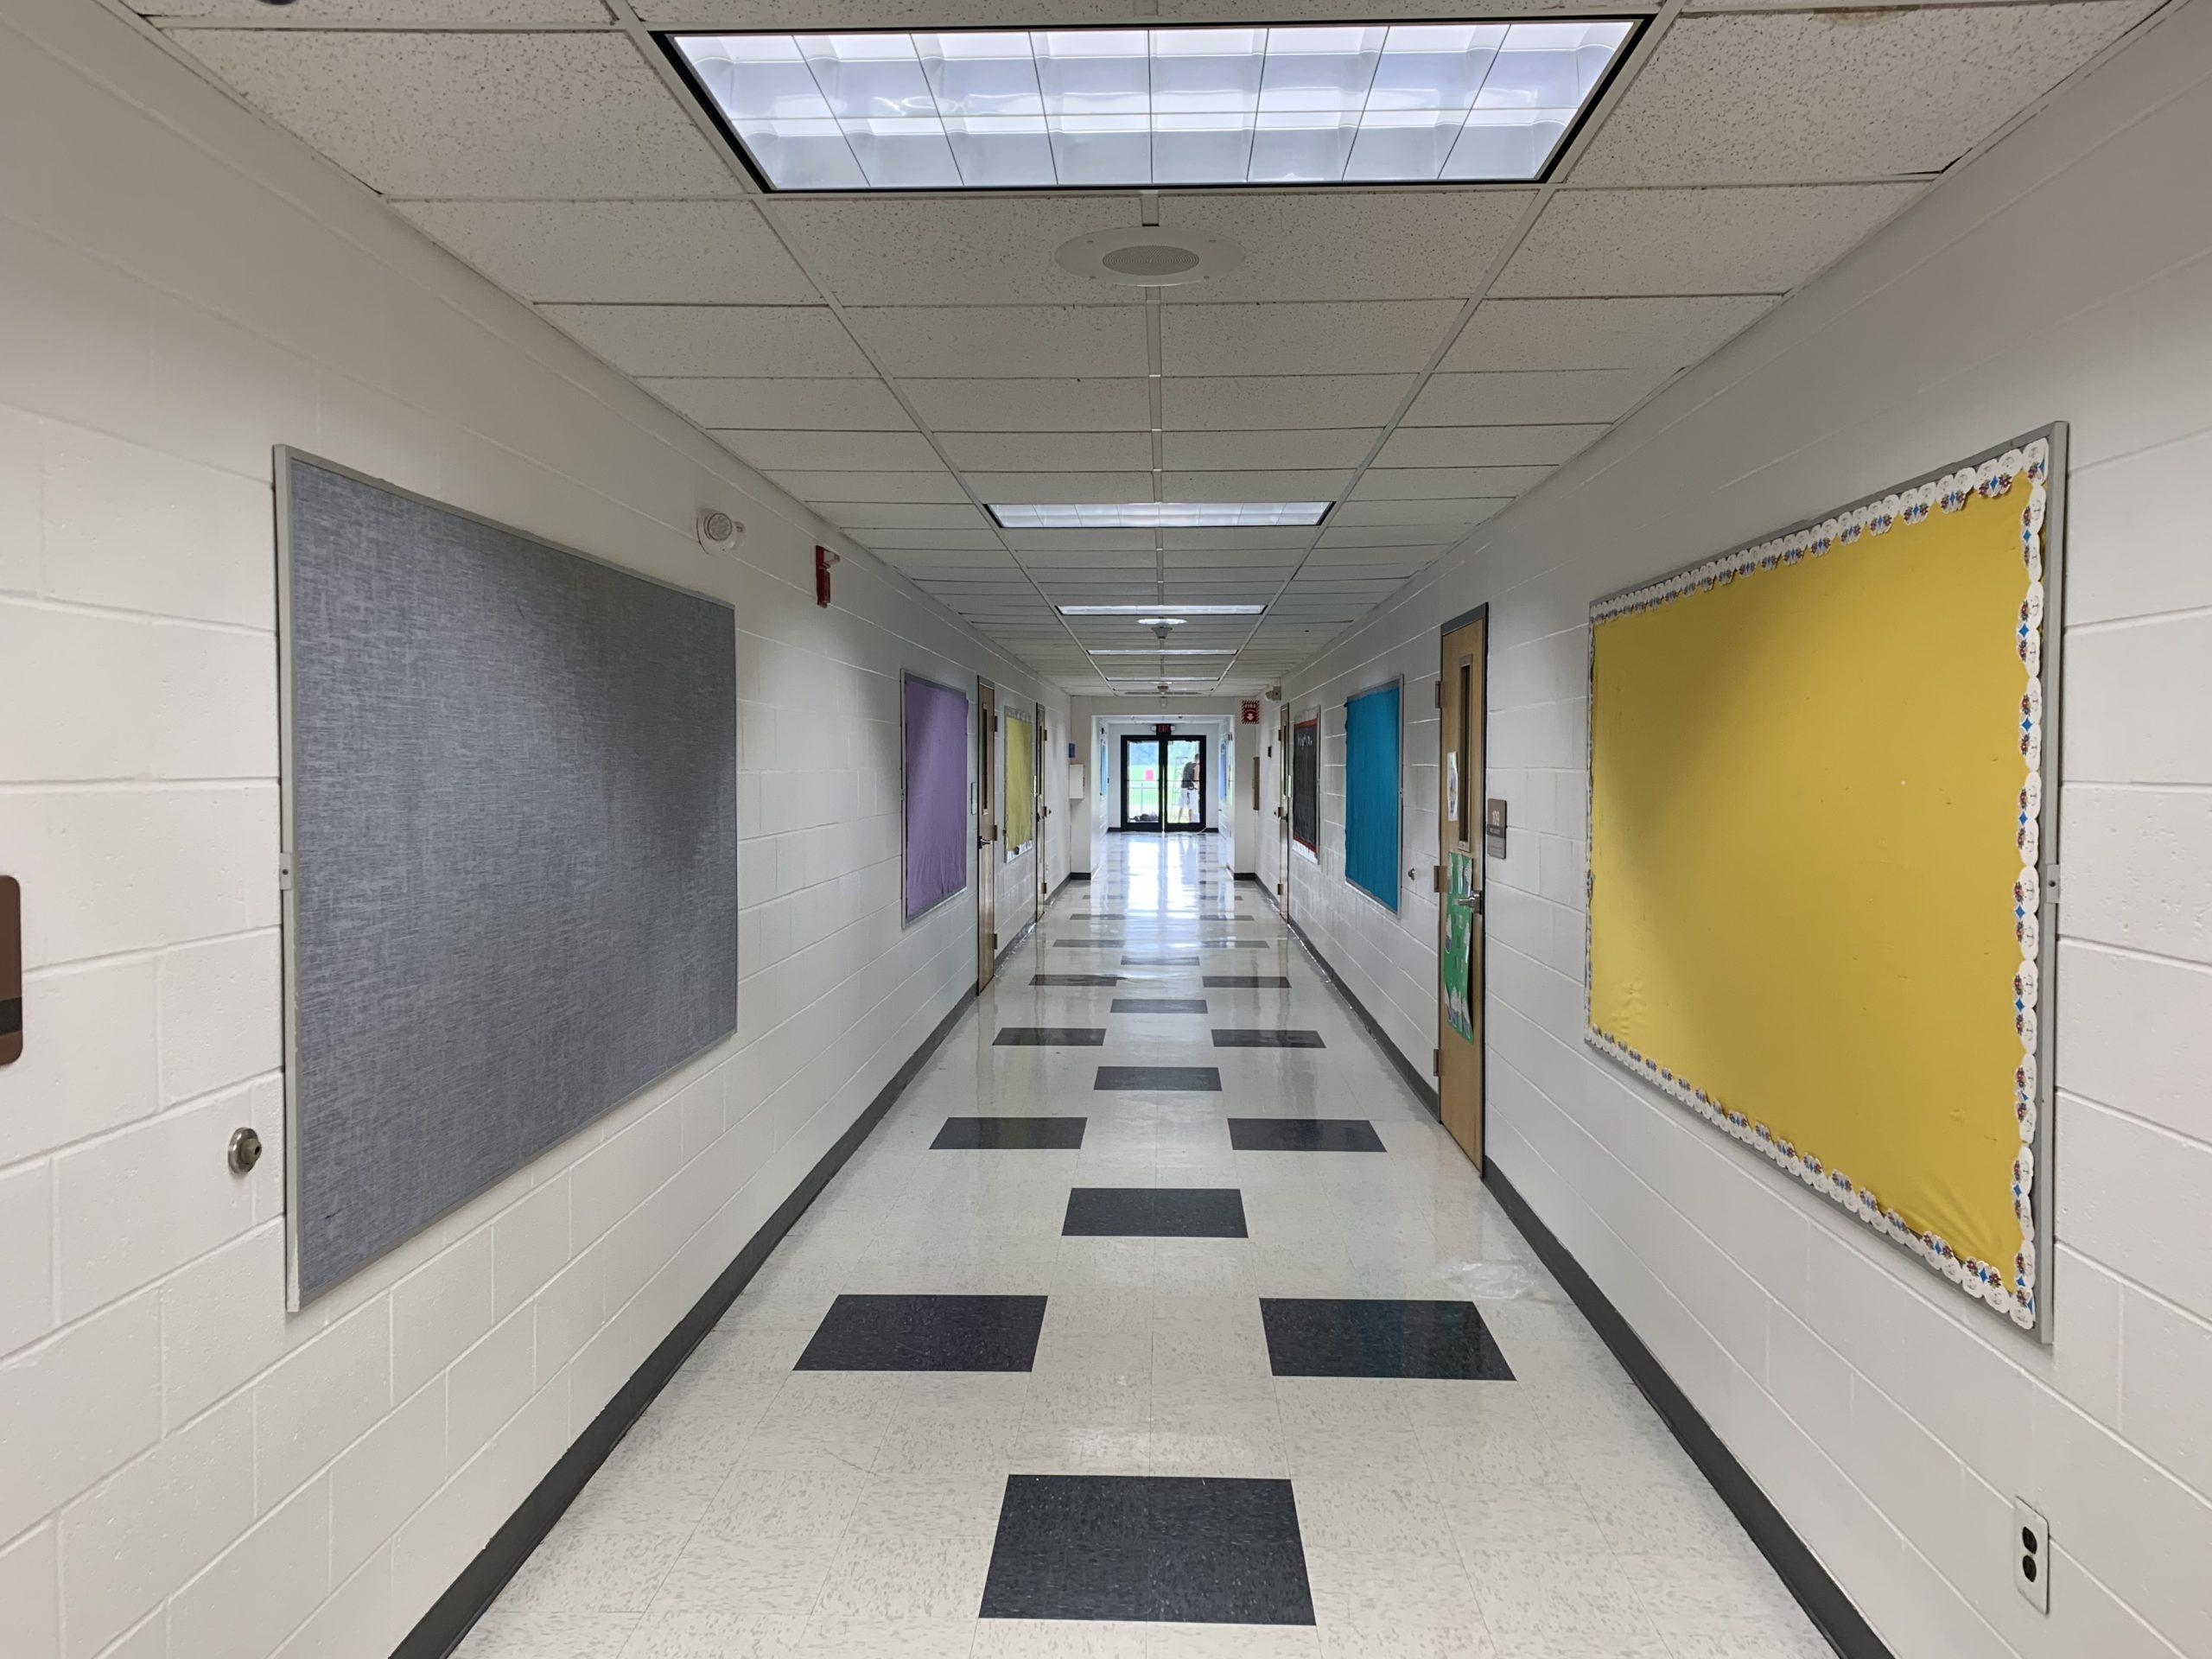 DDS Paints Hallways at Aura Elementary School